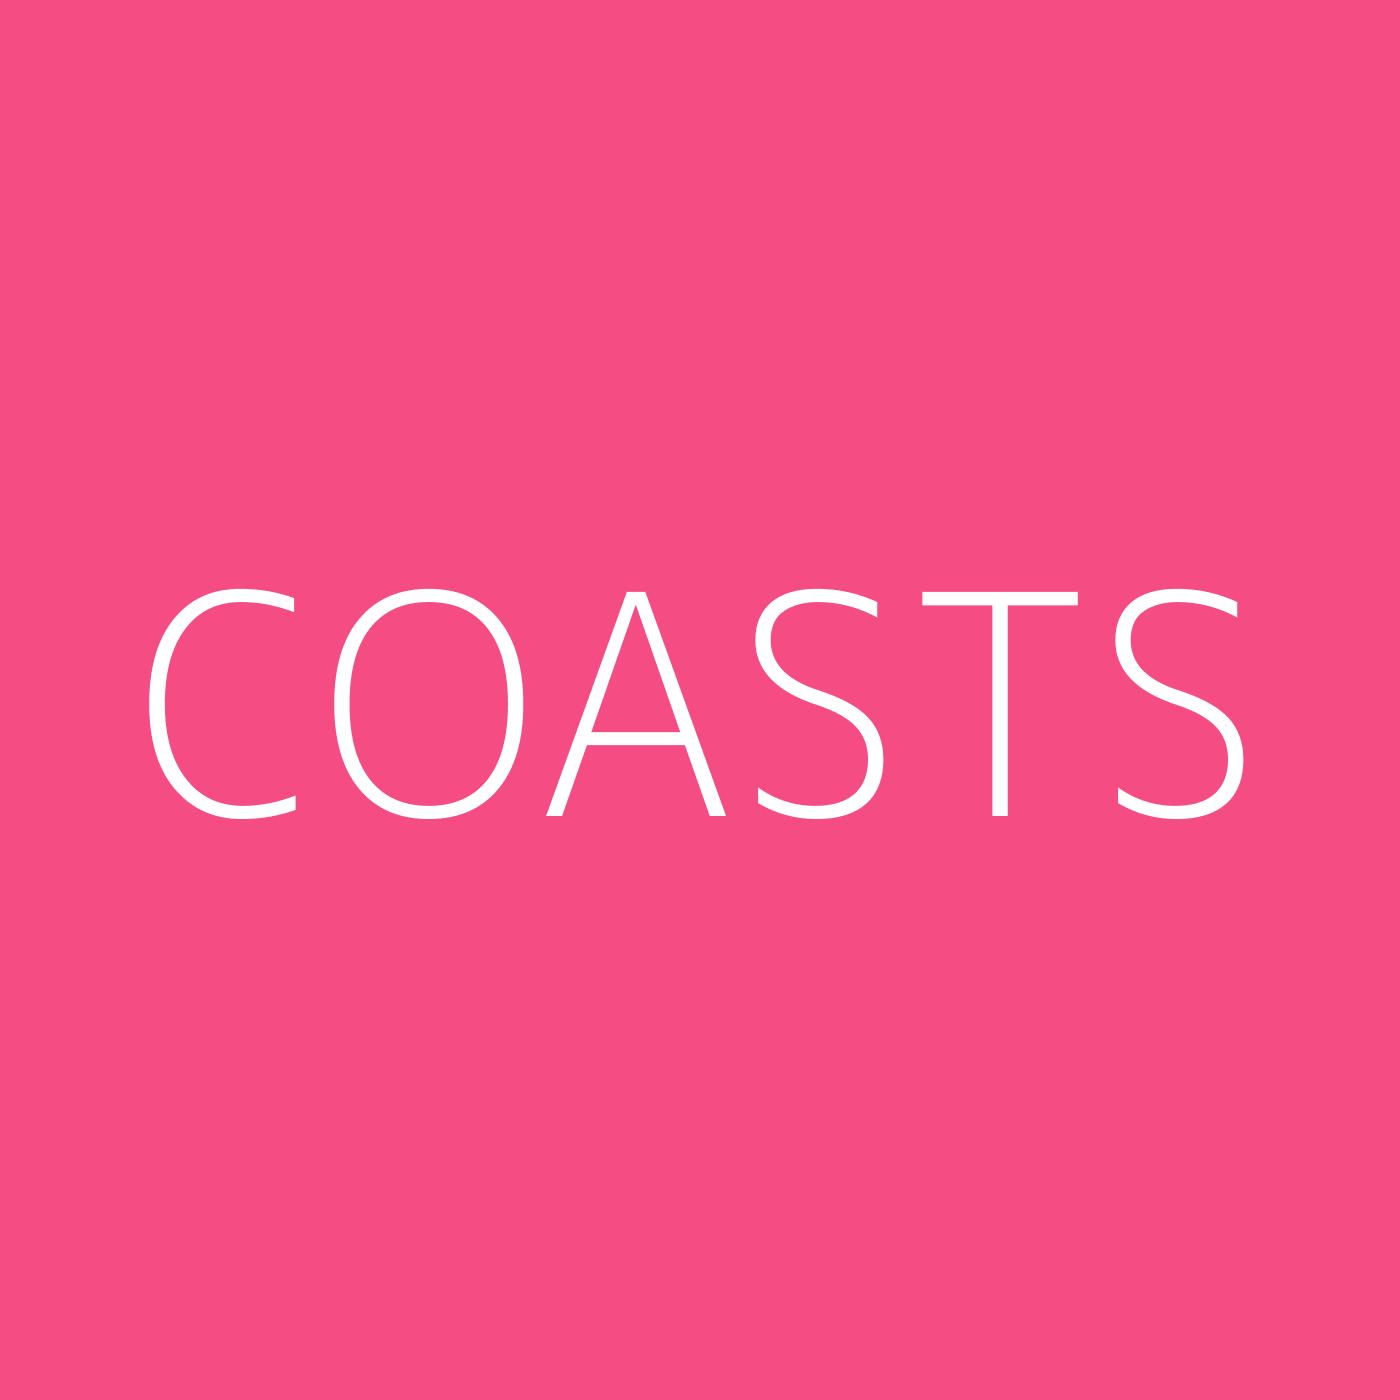 Coasts Playlist Artwork